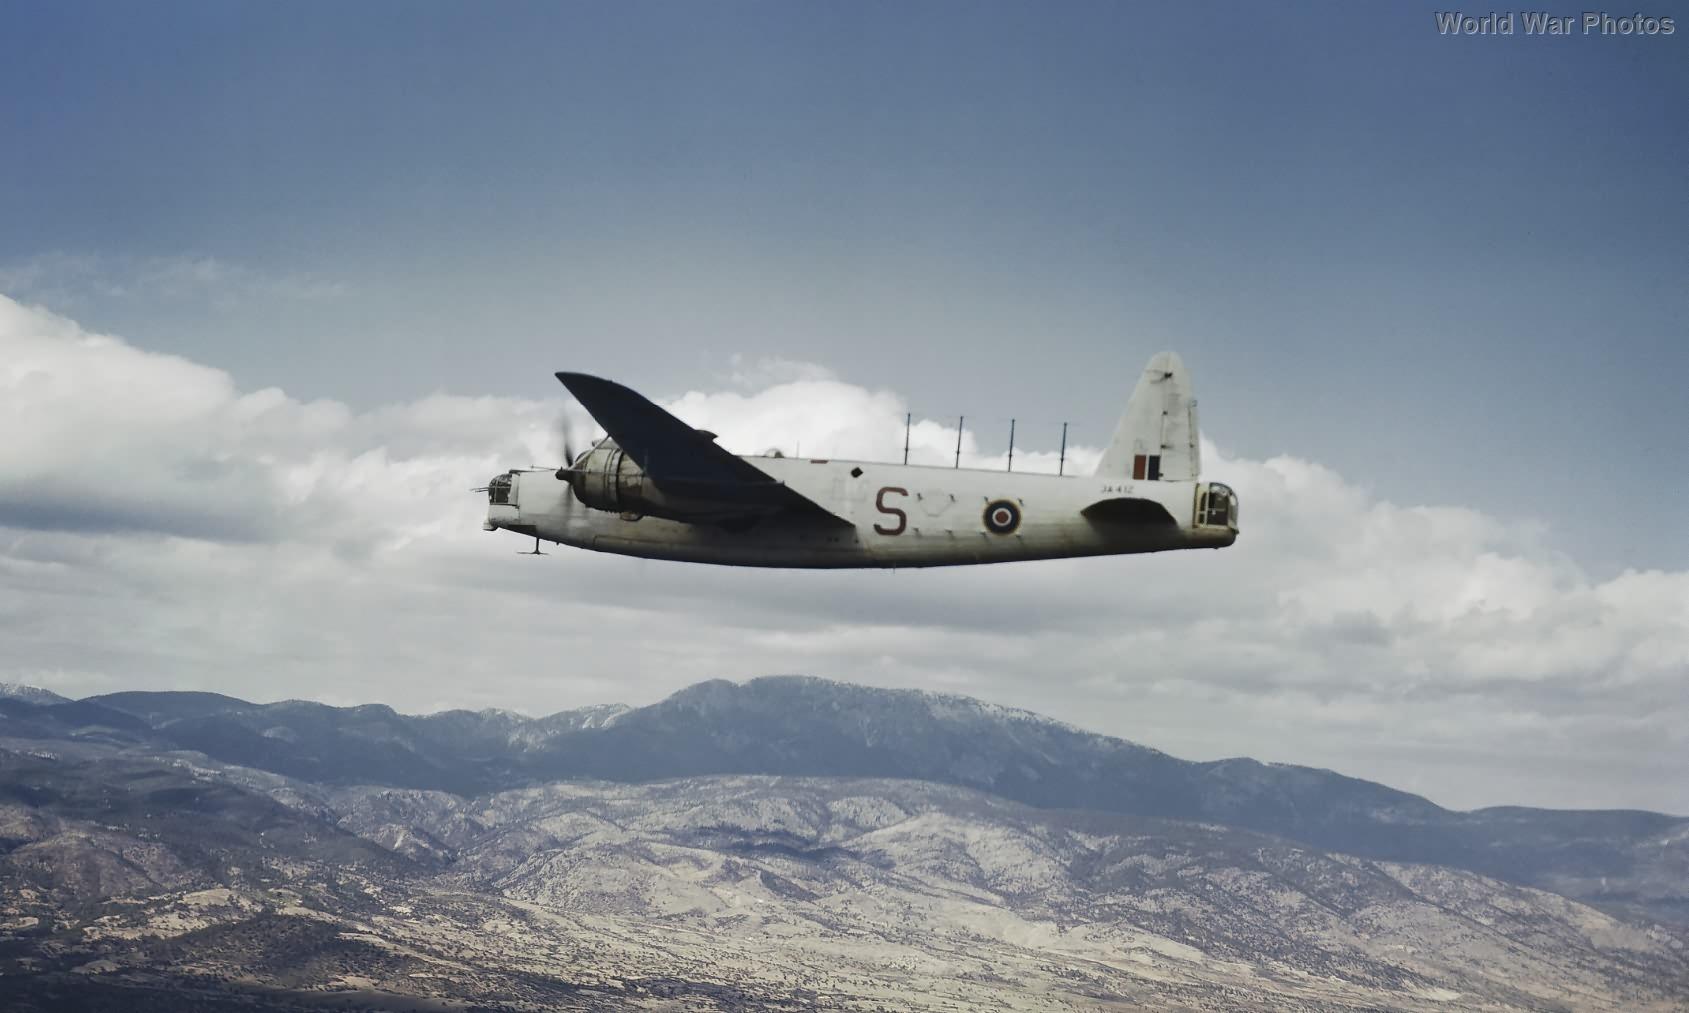 Wellington Mk XII JA412 of No 221 Squadron RAF Greece